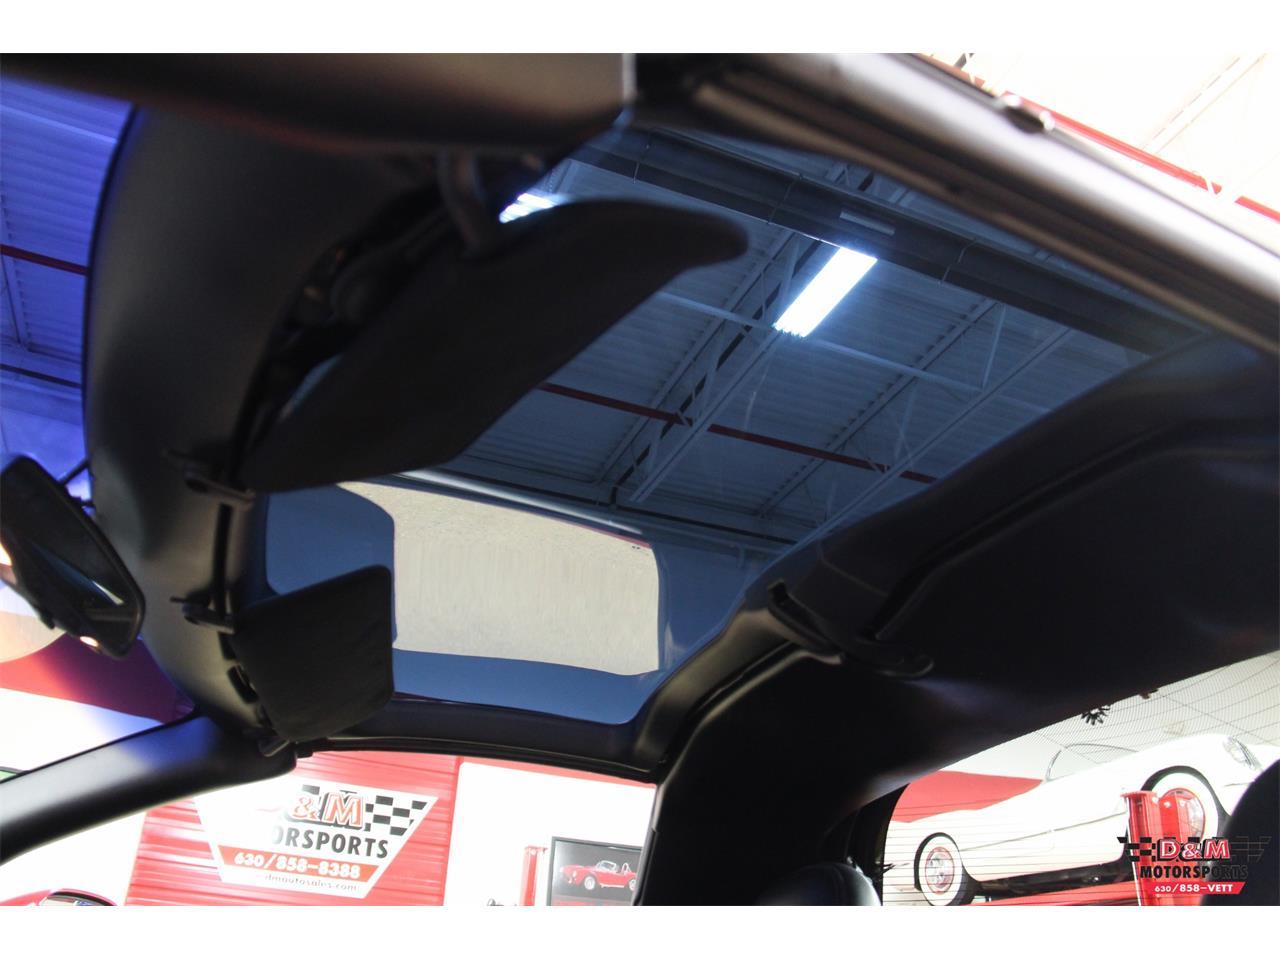 Large Picture of 2000 Chevrolet Corvette located in Illinois - $15,995.00 - LVA3